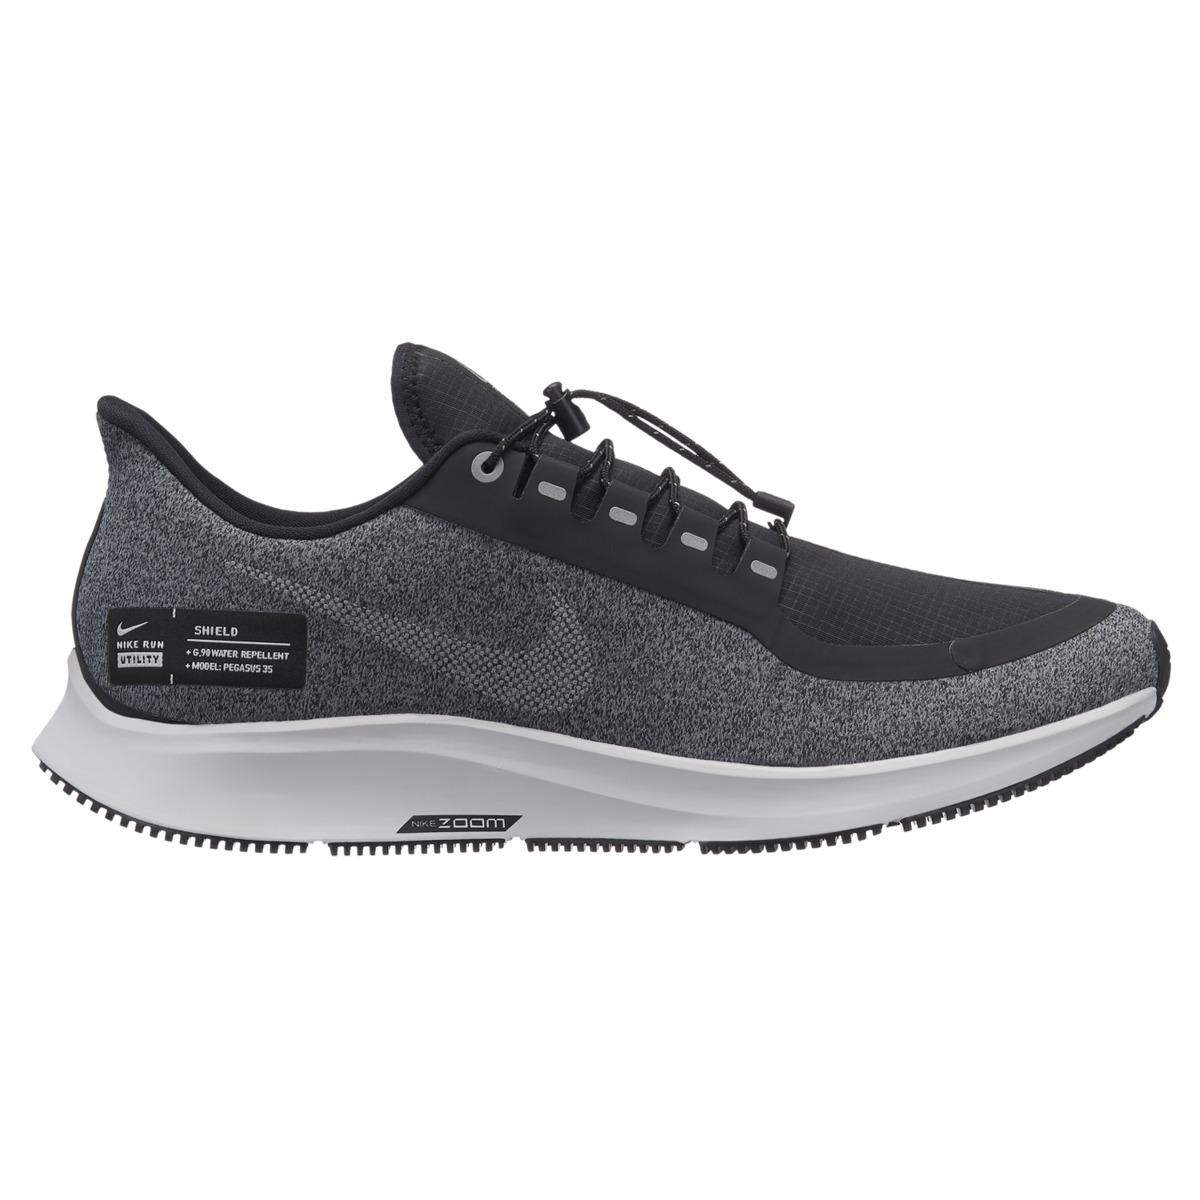 437b8ddd724a1 Nike Air Zoom Pegasus 35 Shield Running Shoes in Black for Men - Lyst